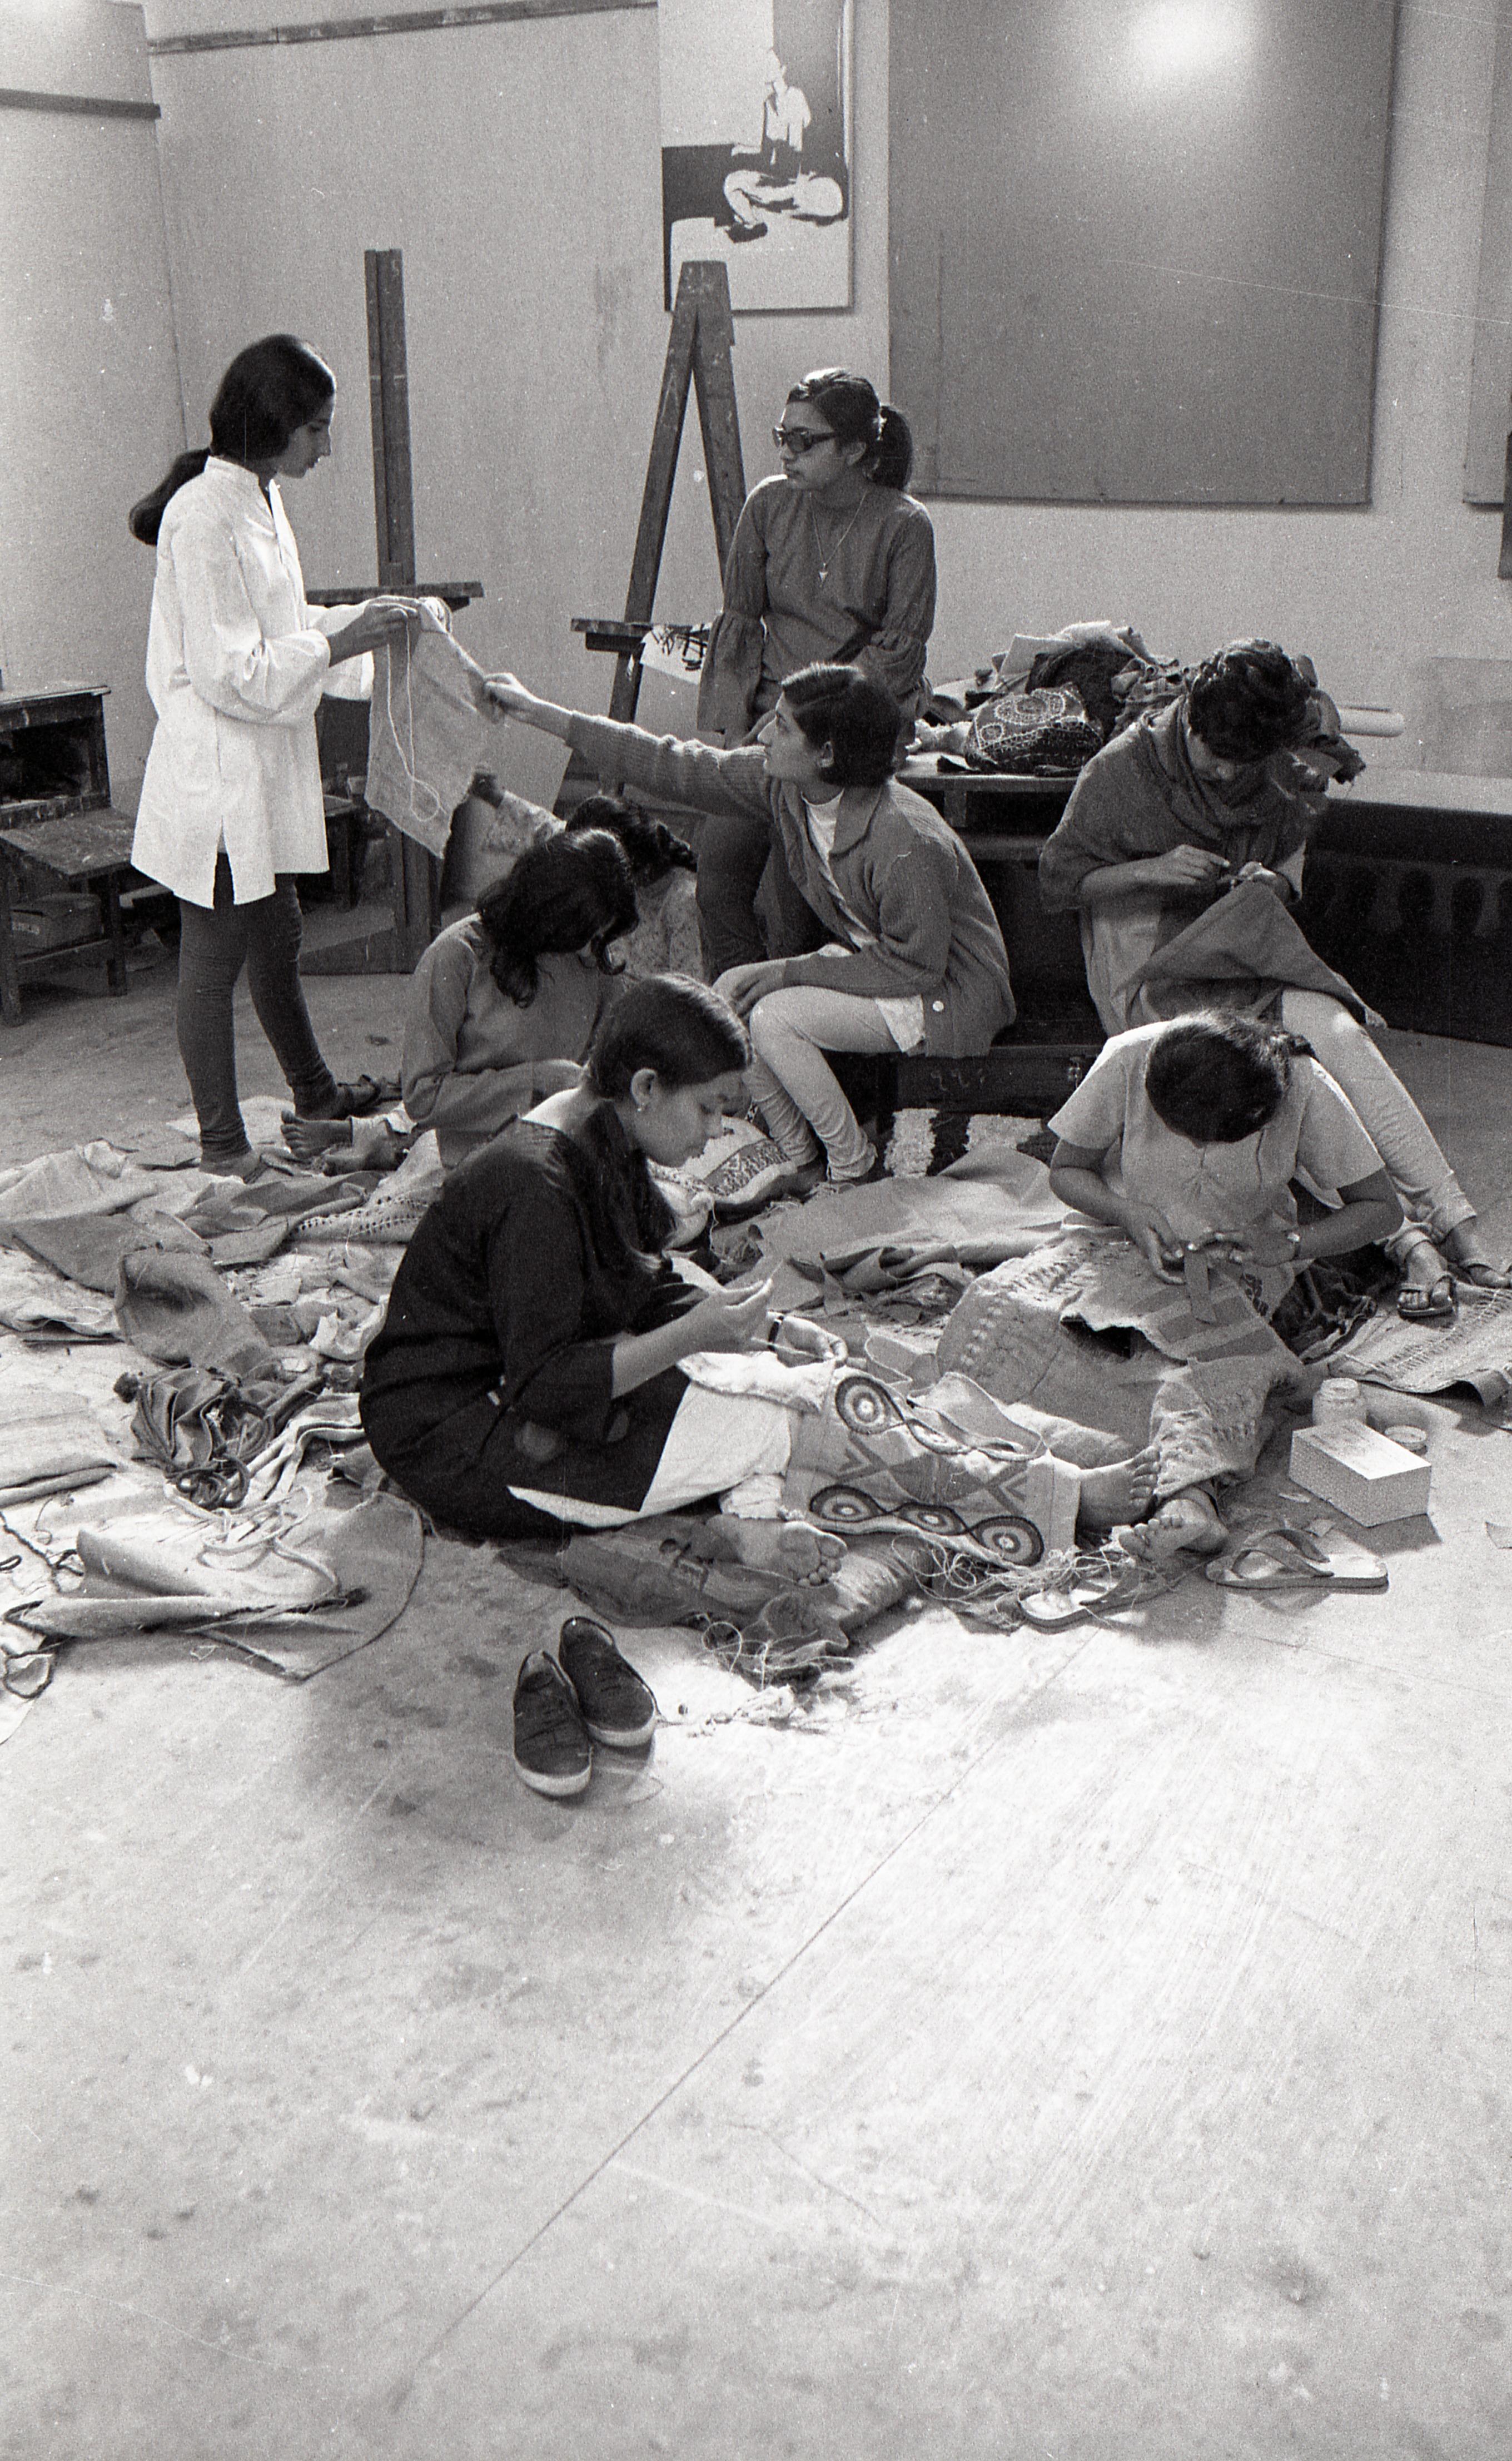 Preparation for the Fine Arts Fair, 1970